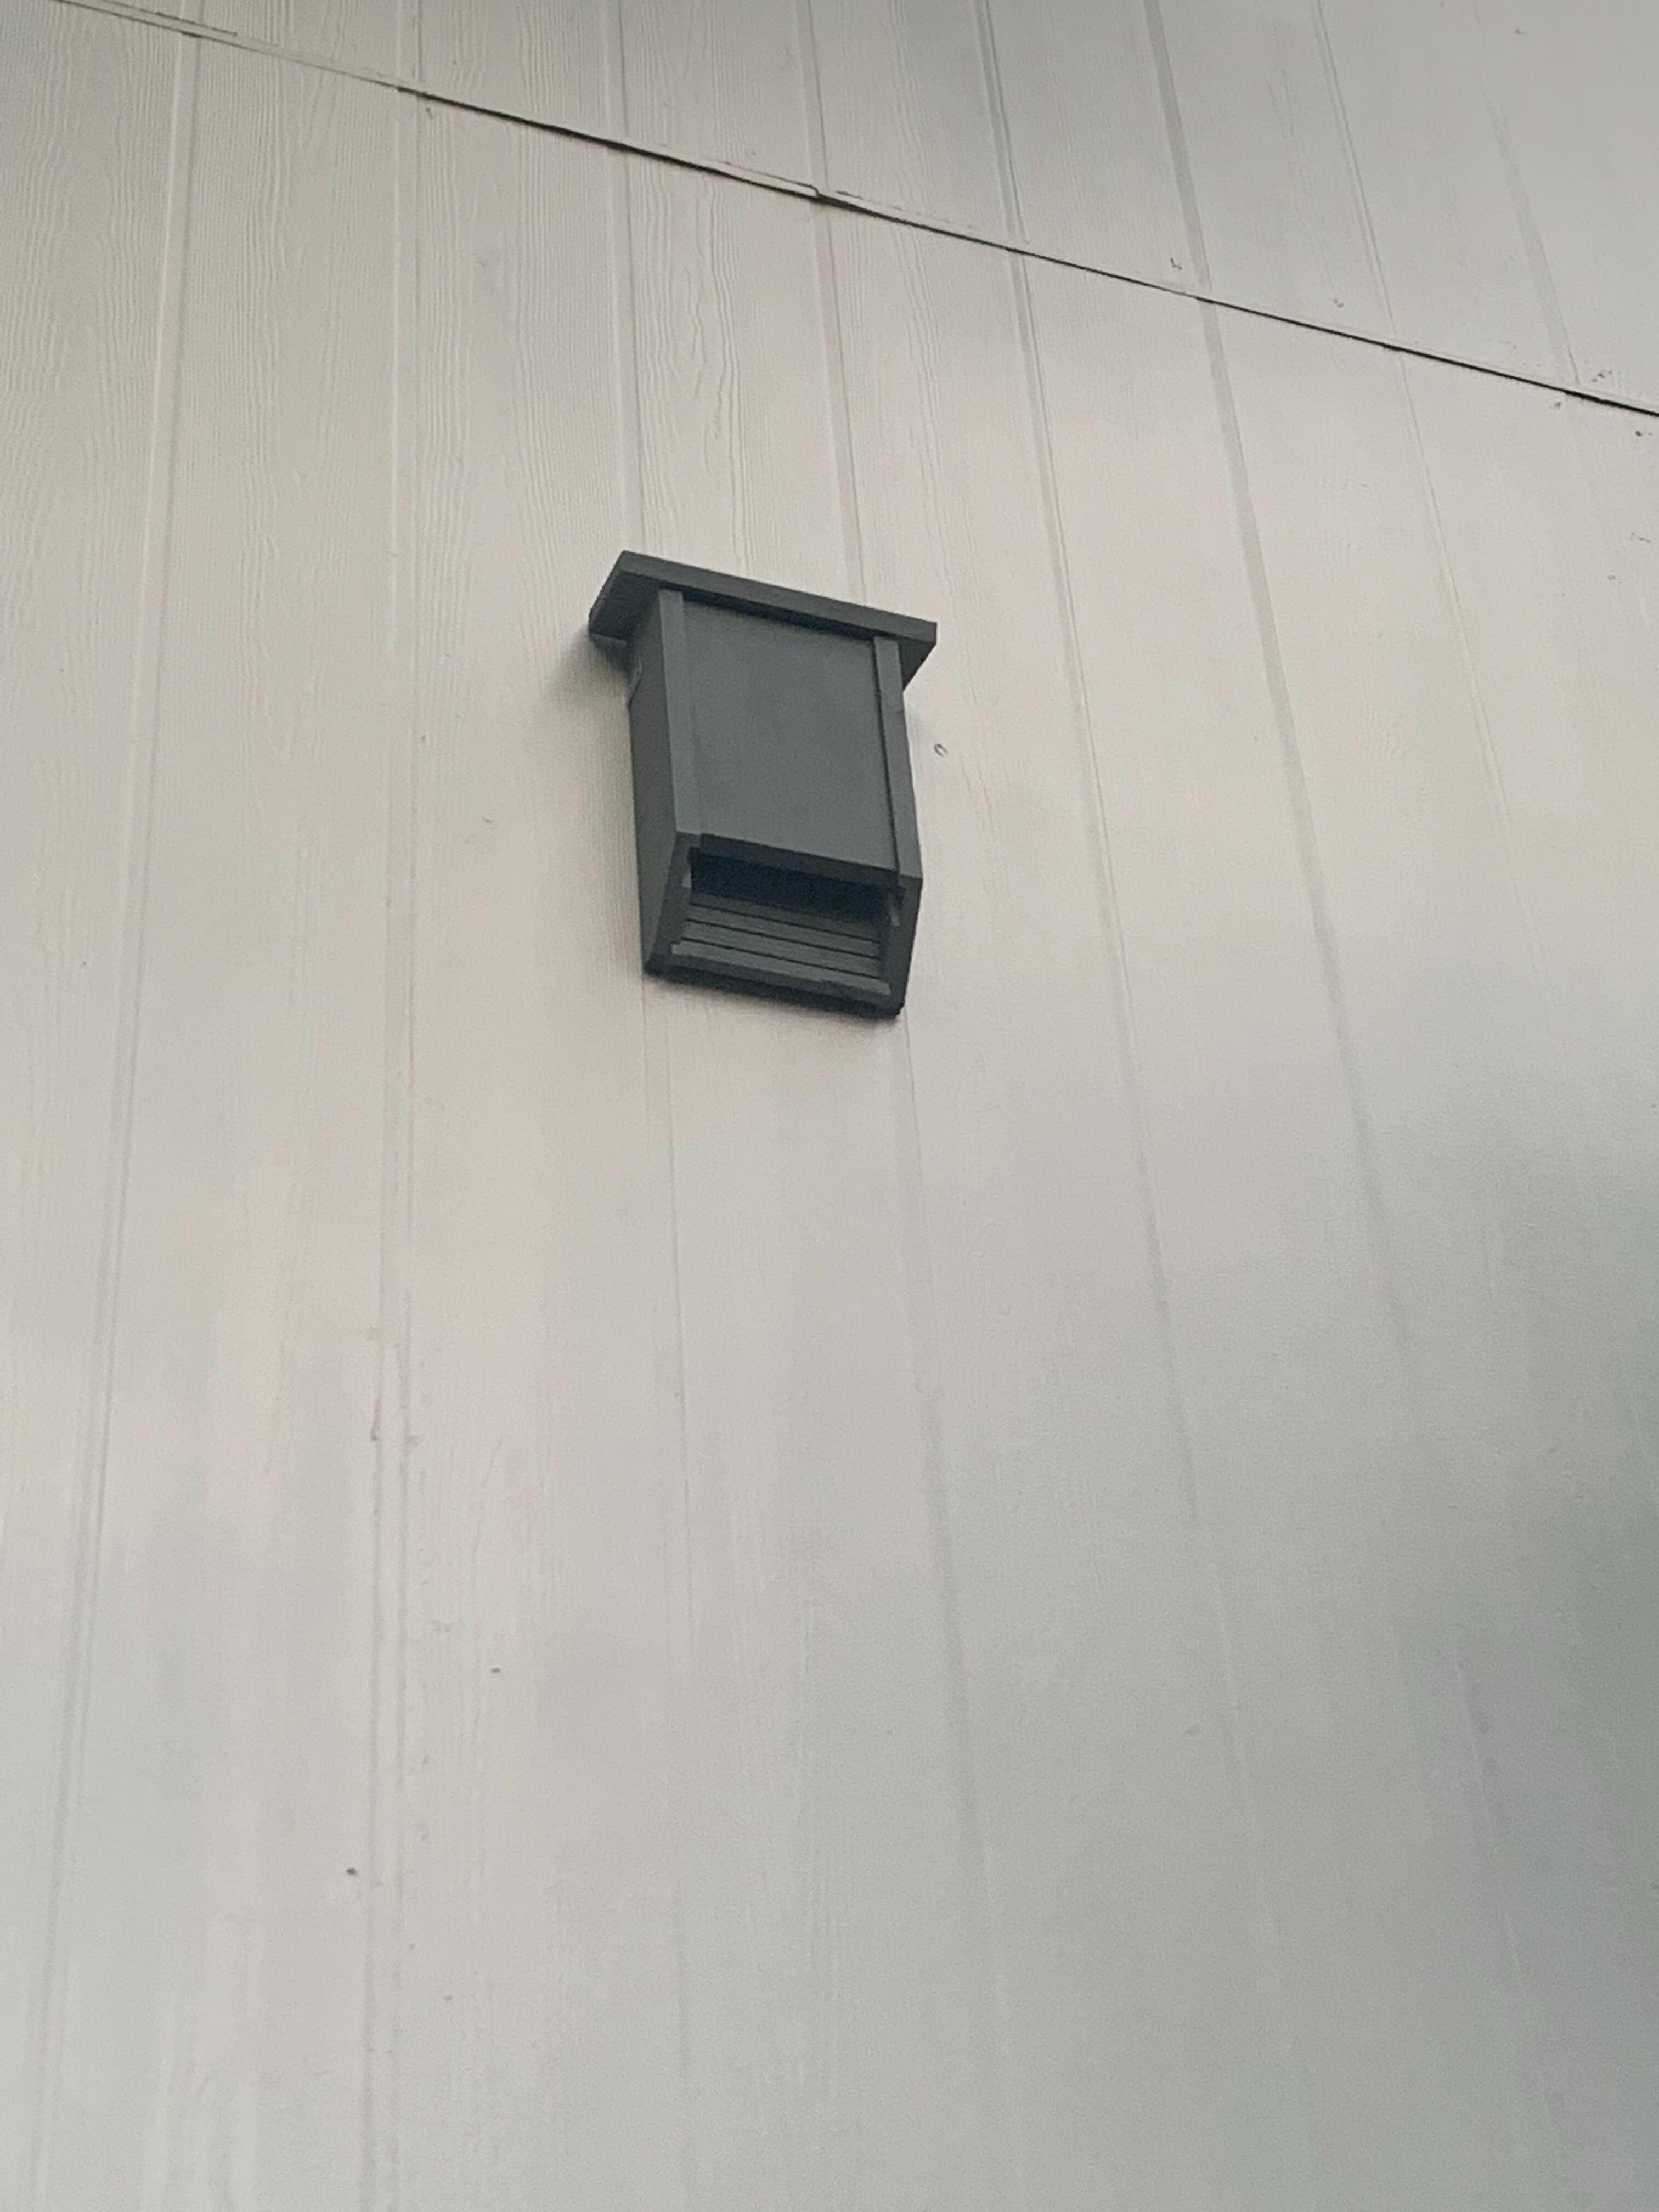 Cedar Bat House Install